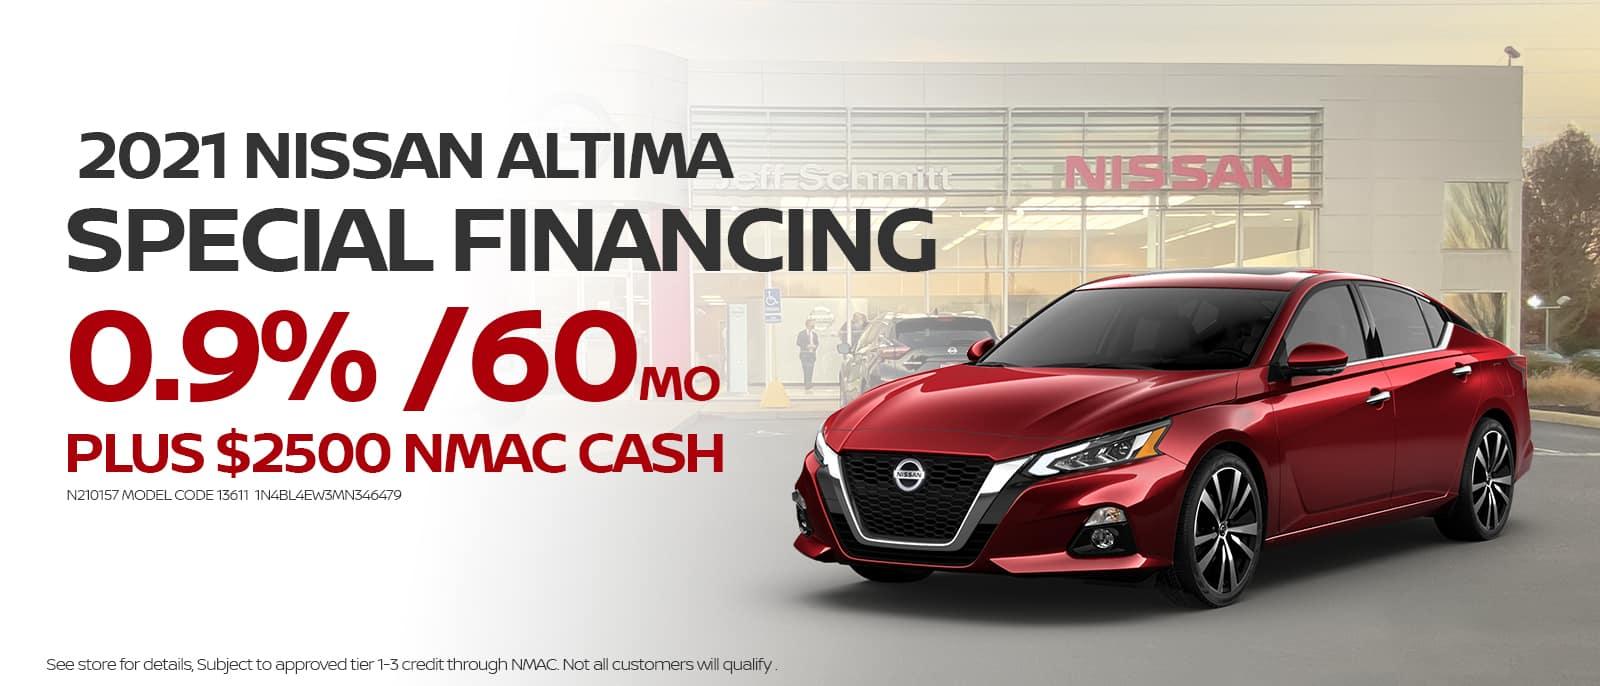 Altima Financing